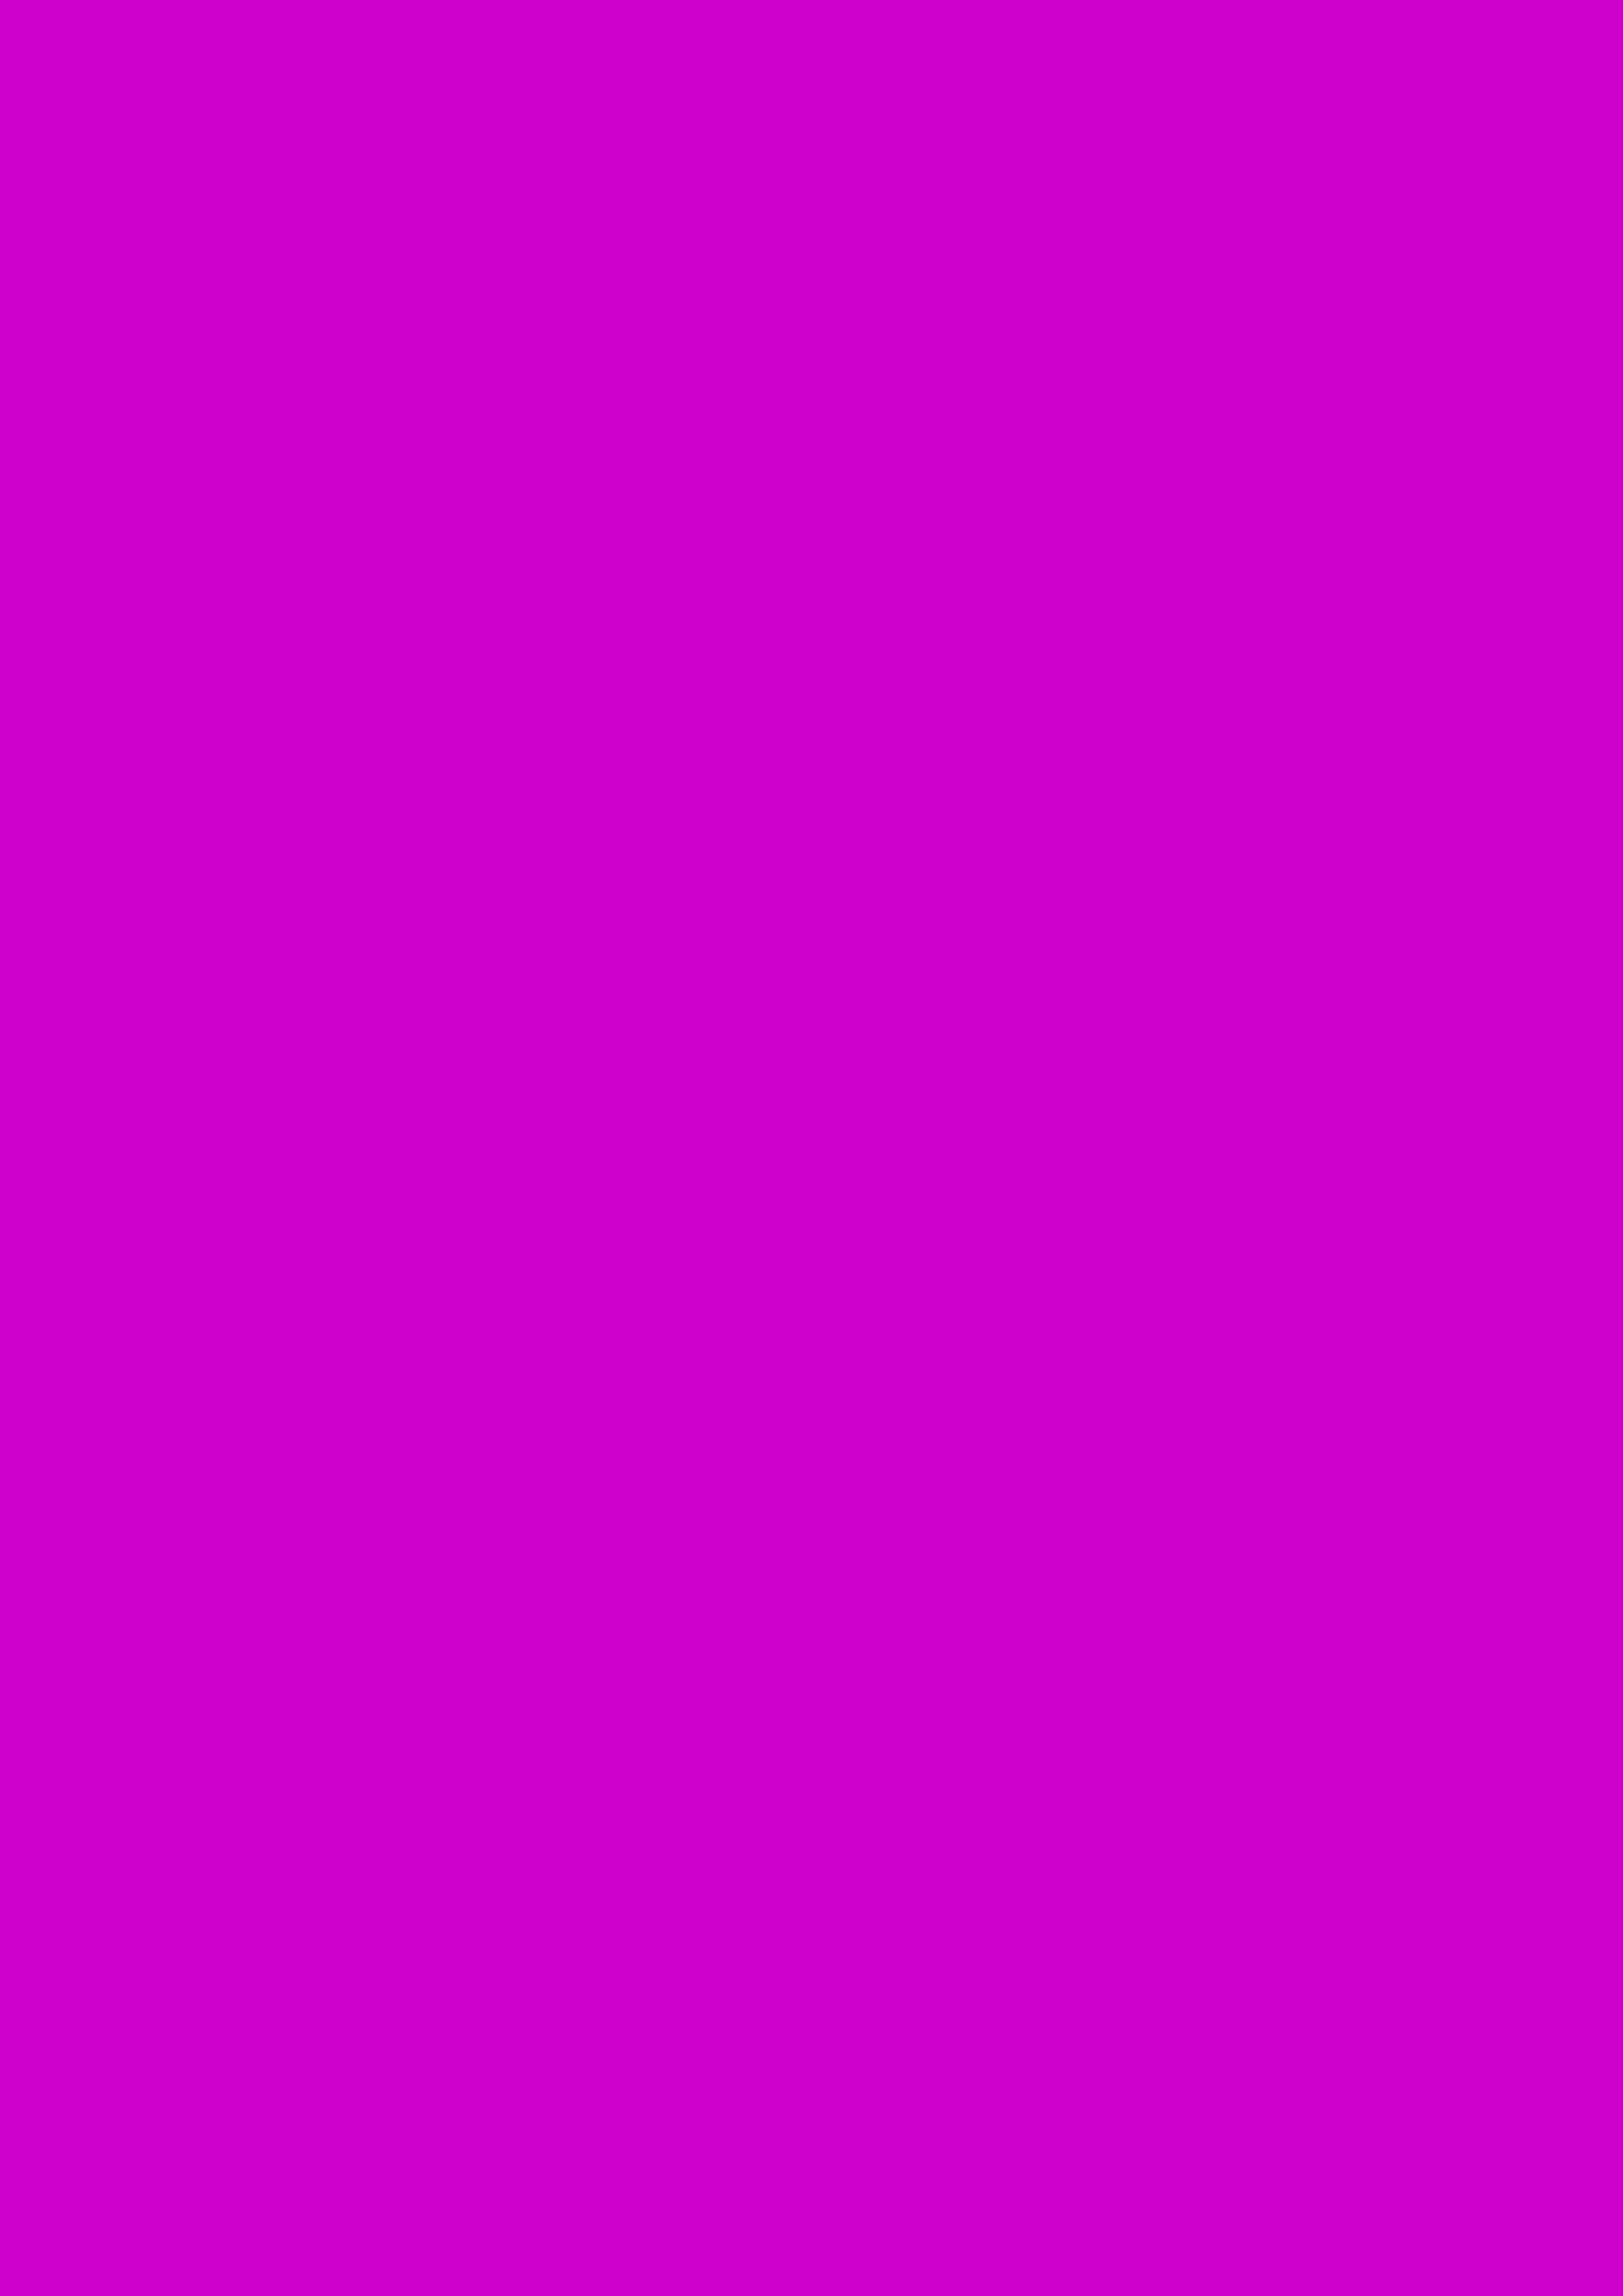 2480x3508 Deep Magenta Solid Color Background